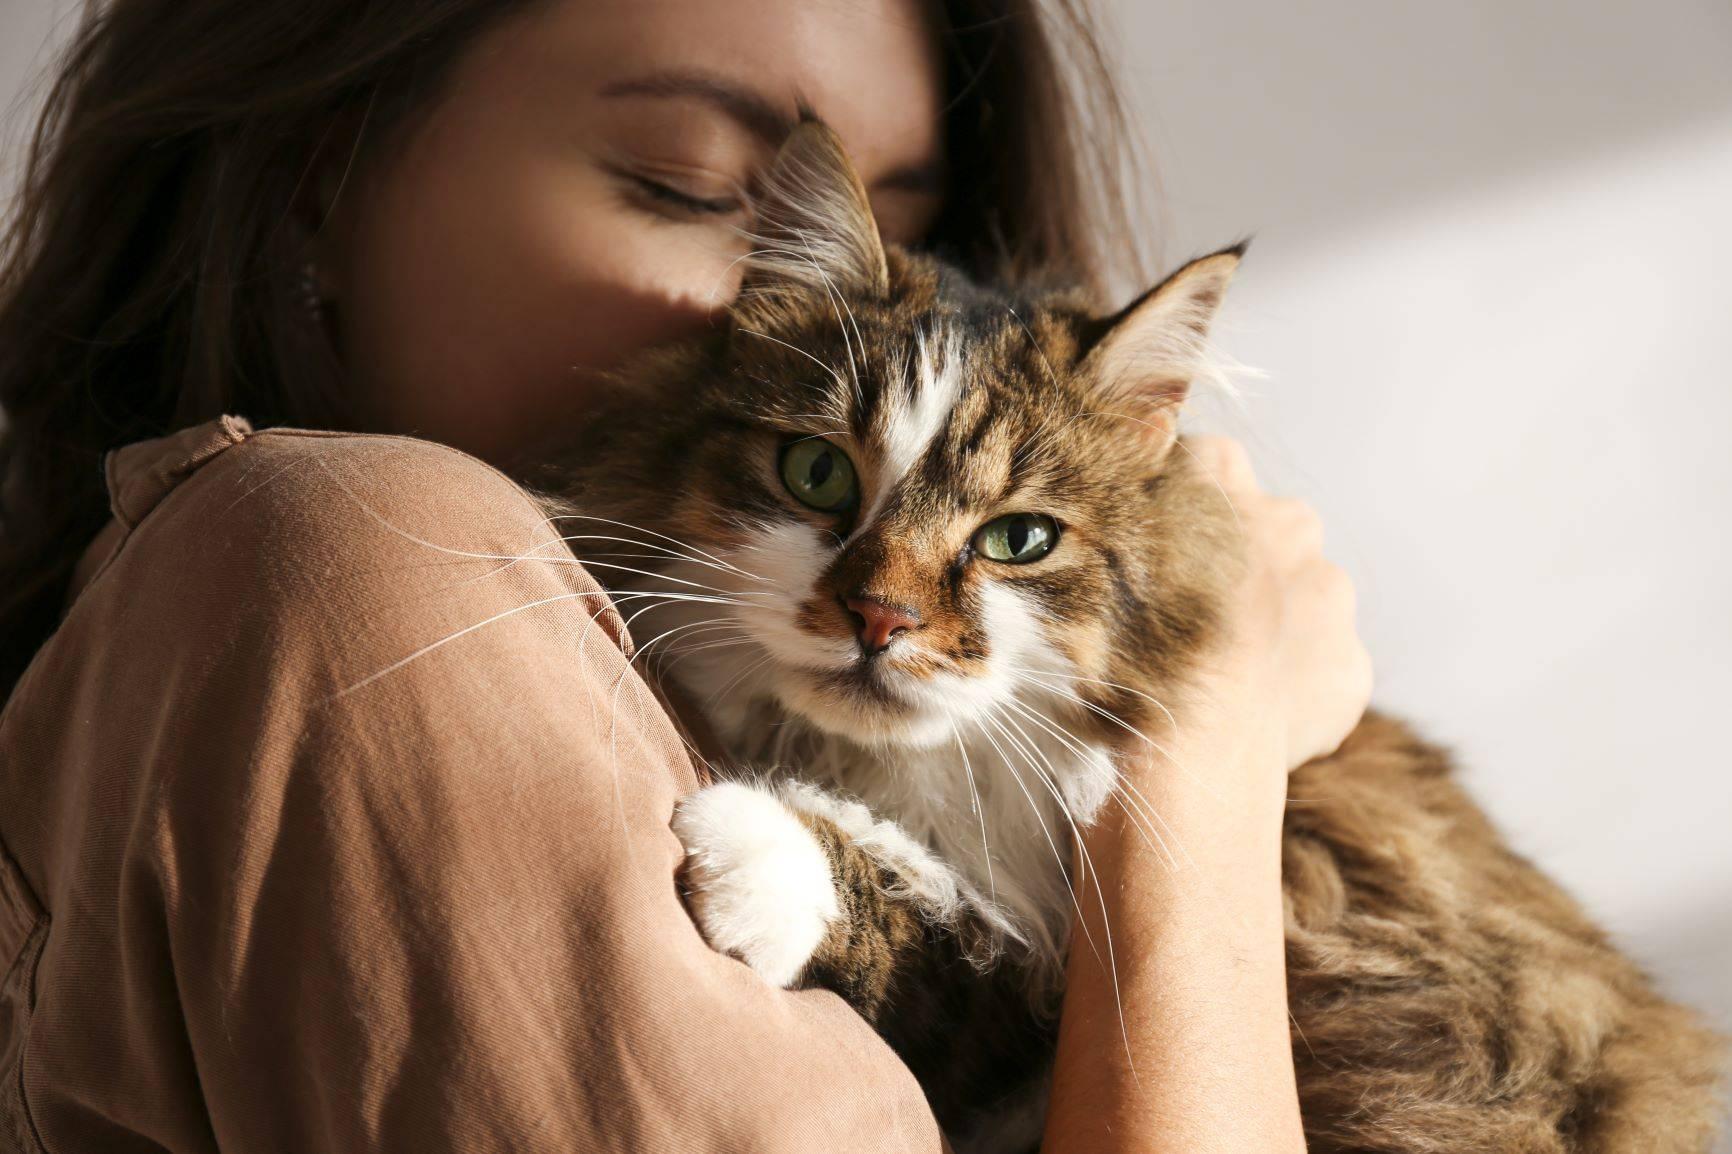 Przytualnie kota niweluje stres - na czym polega kototerapia?